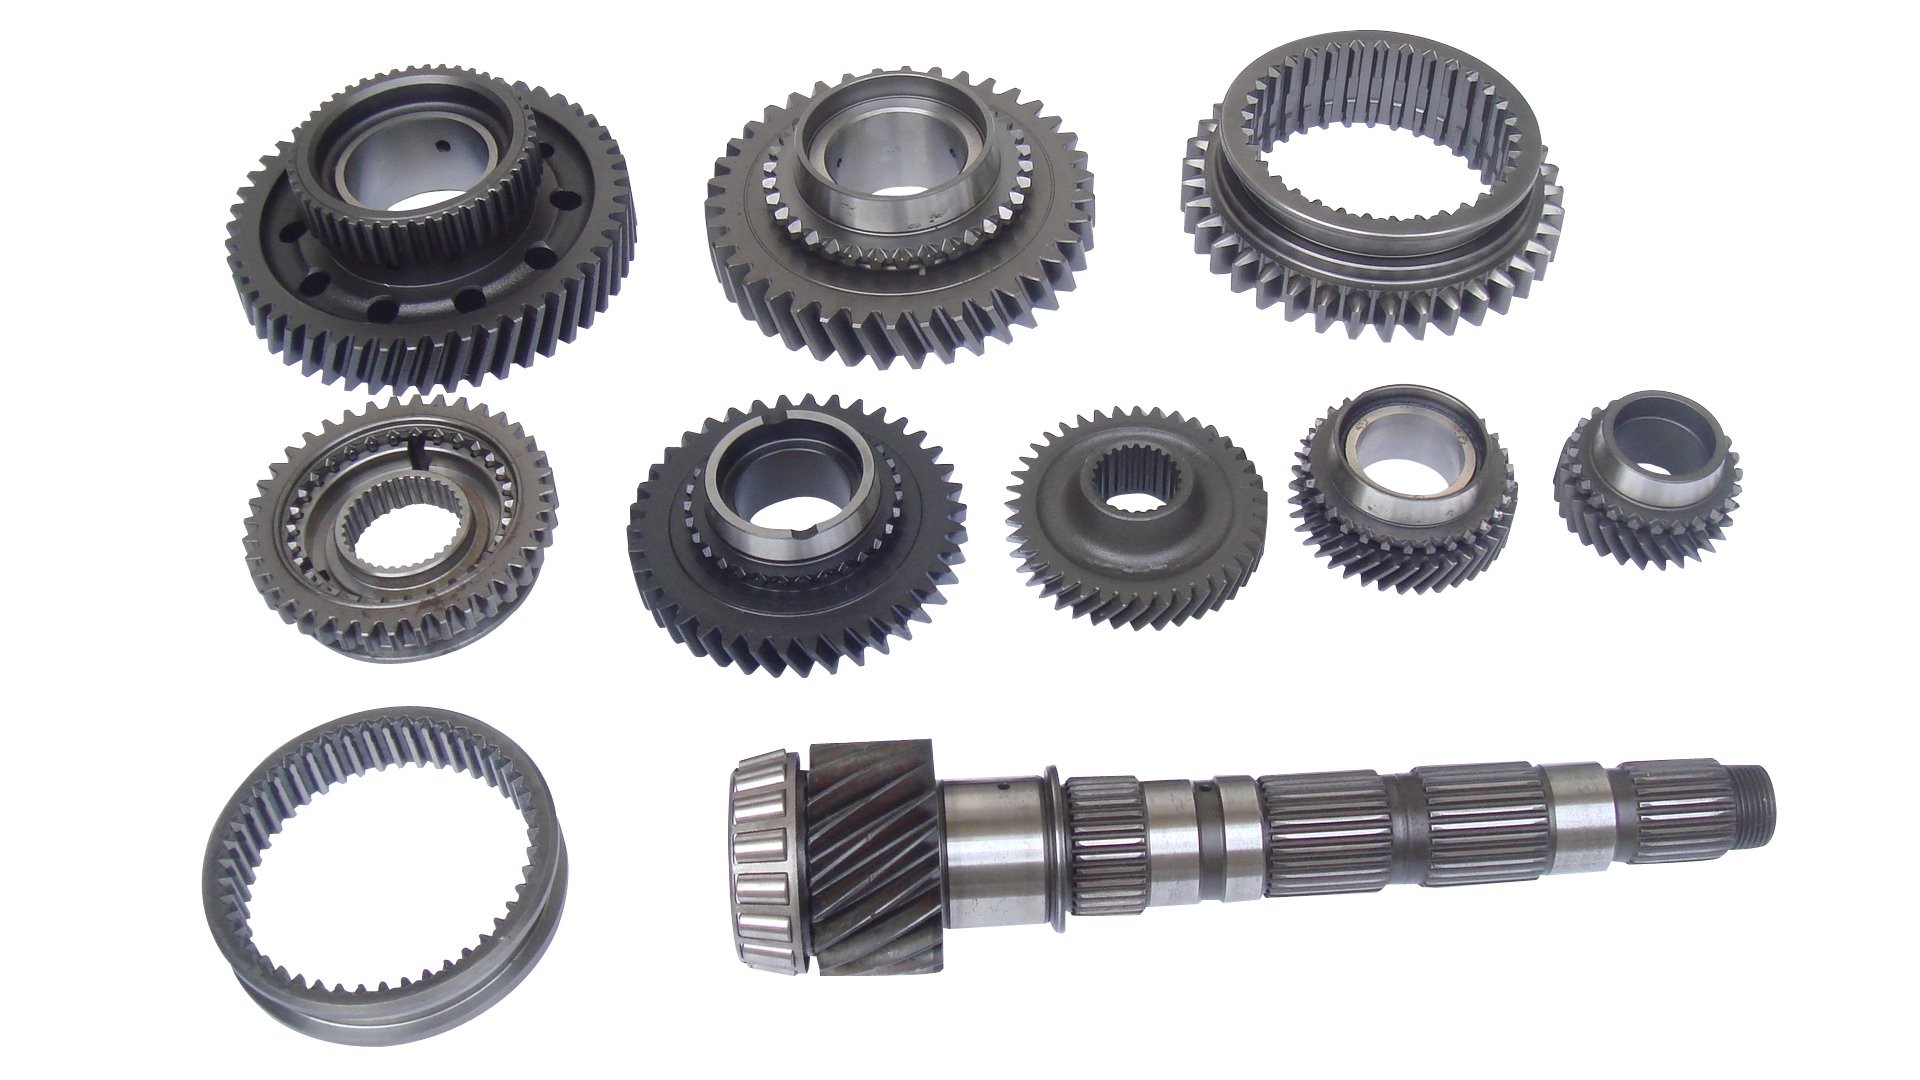 Auto Parts HD PNG - 93940